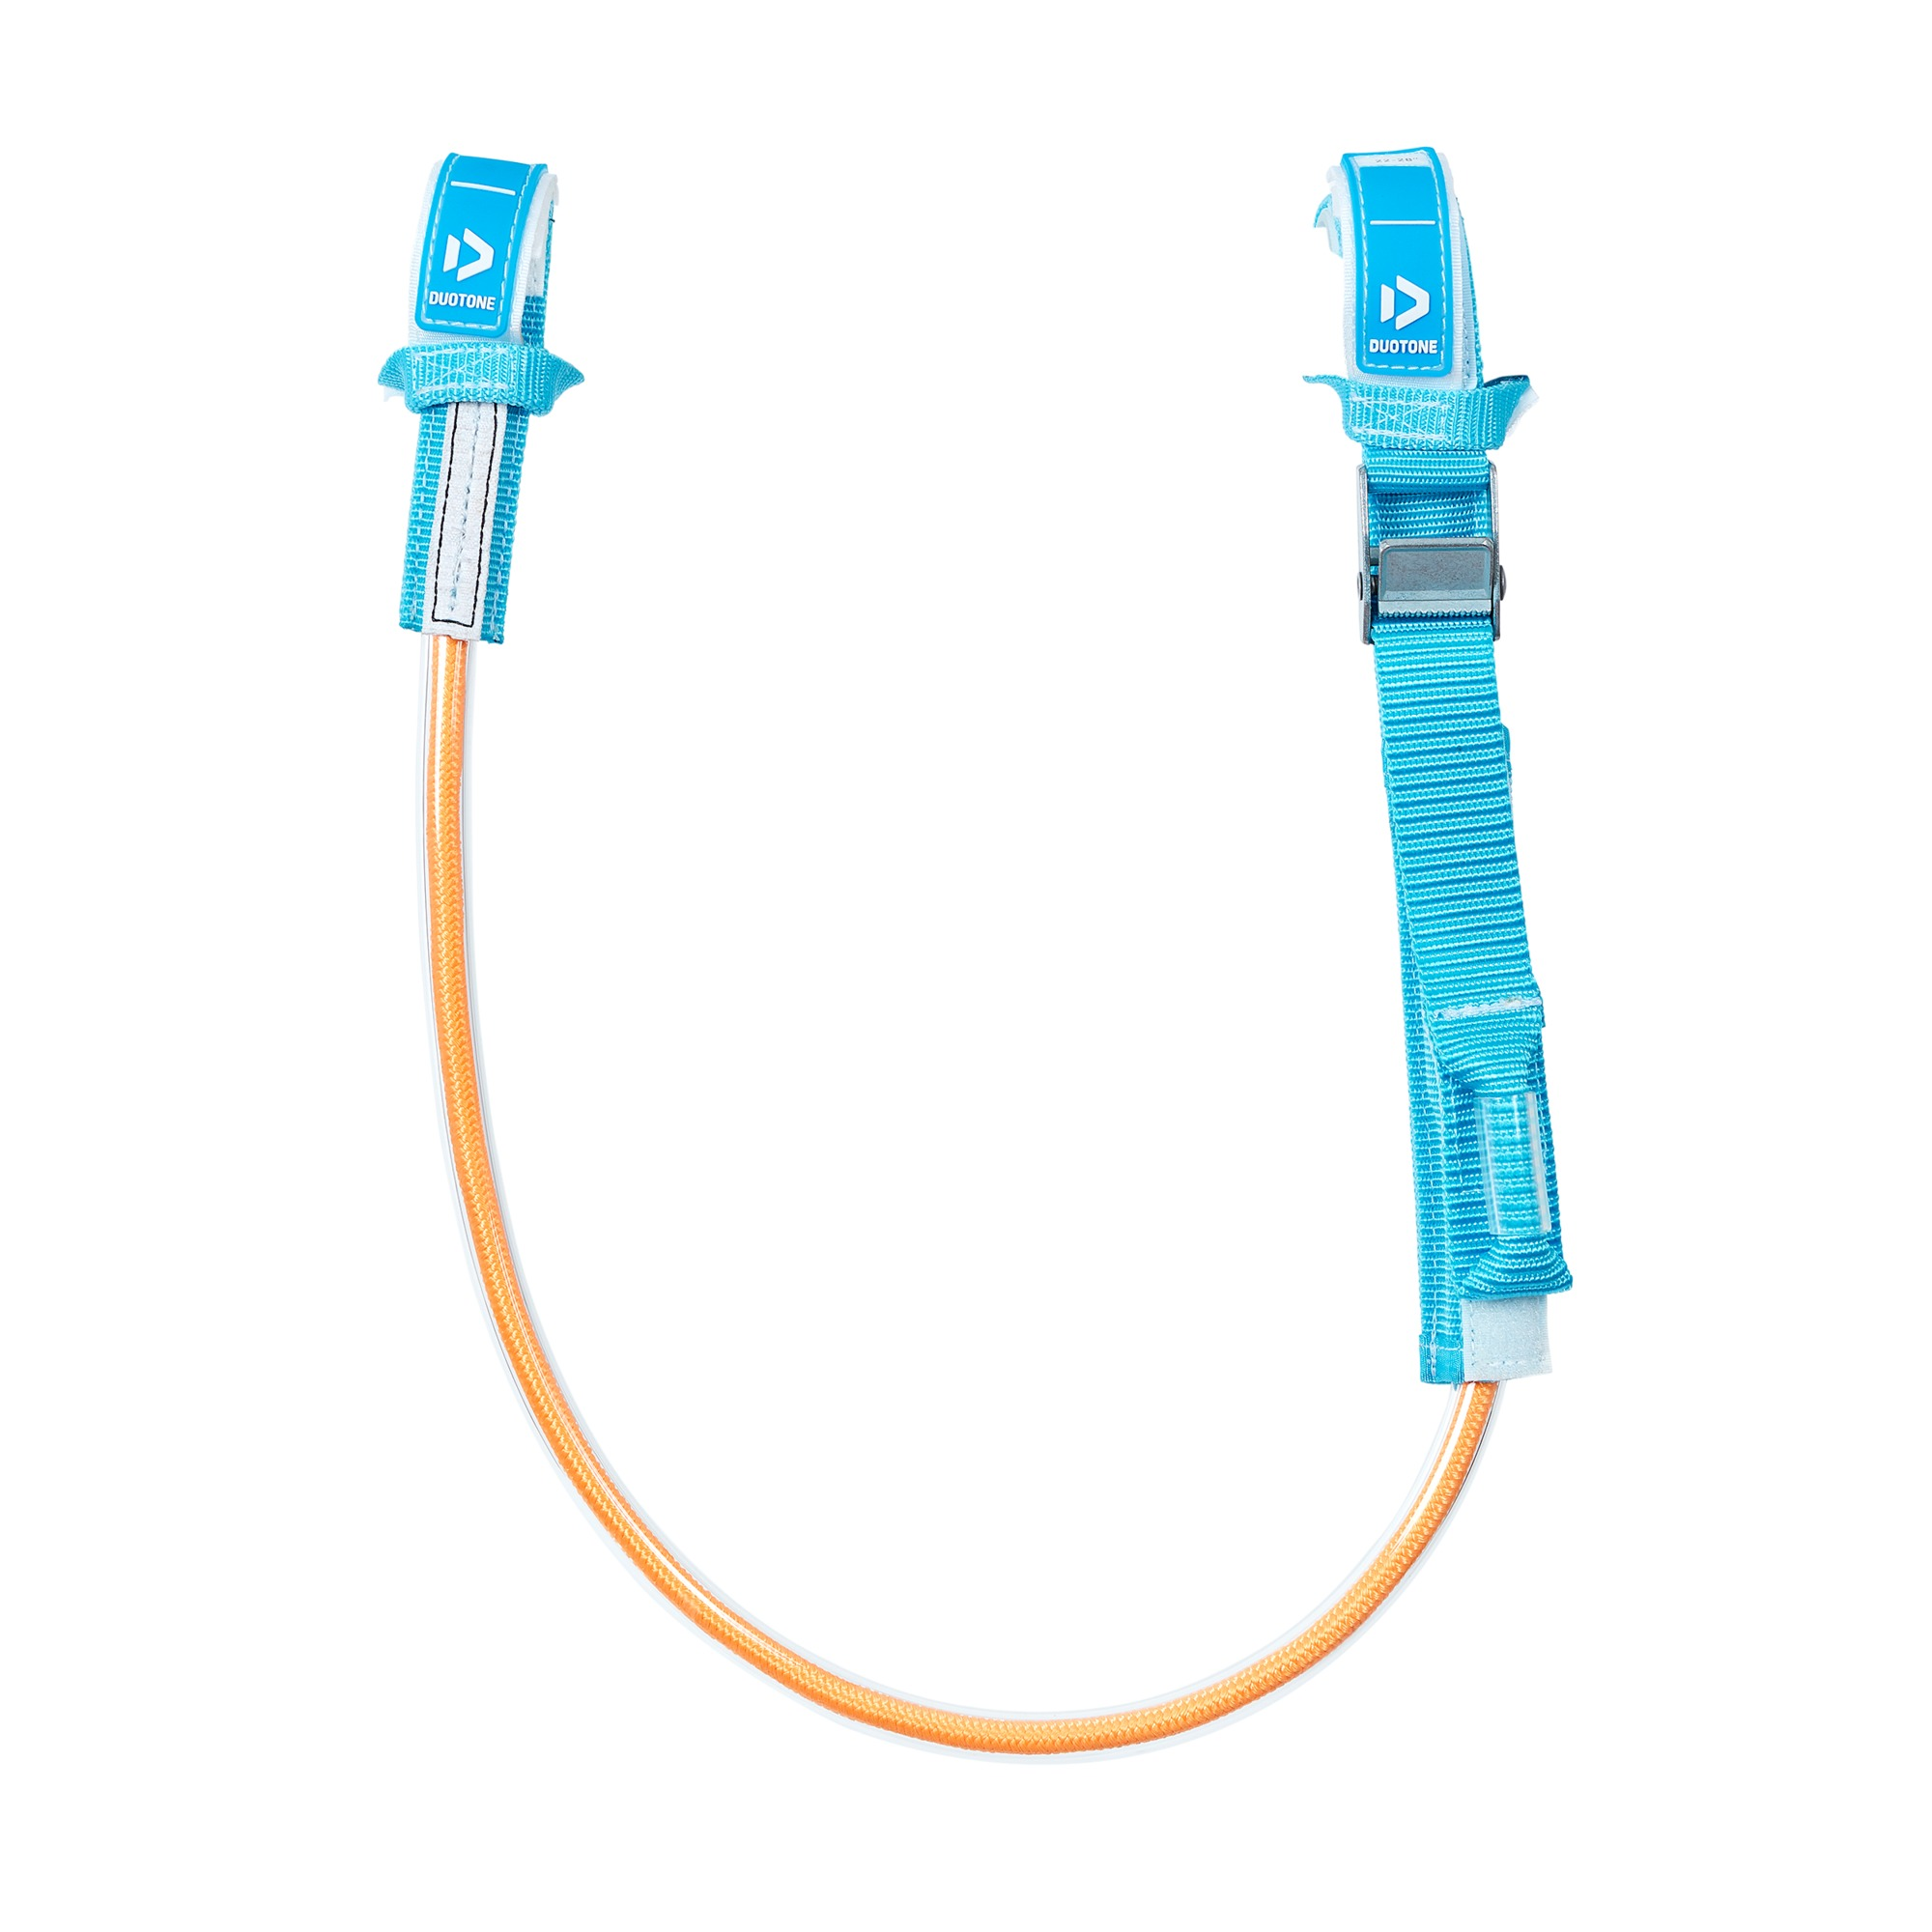 Harness Lines Vario Race Blue-Orange verstellbar Trapeztampen Duotone